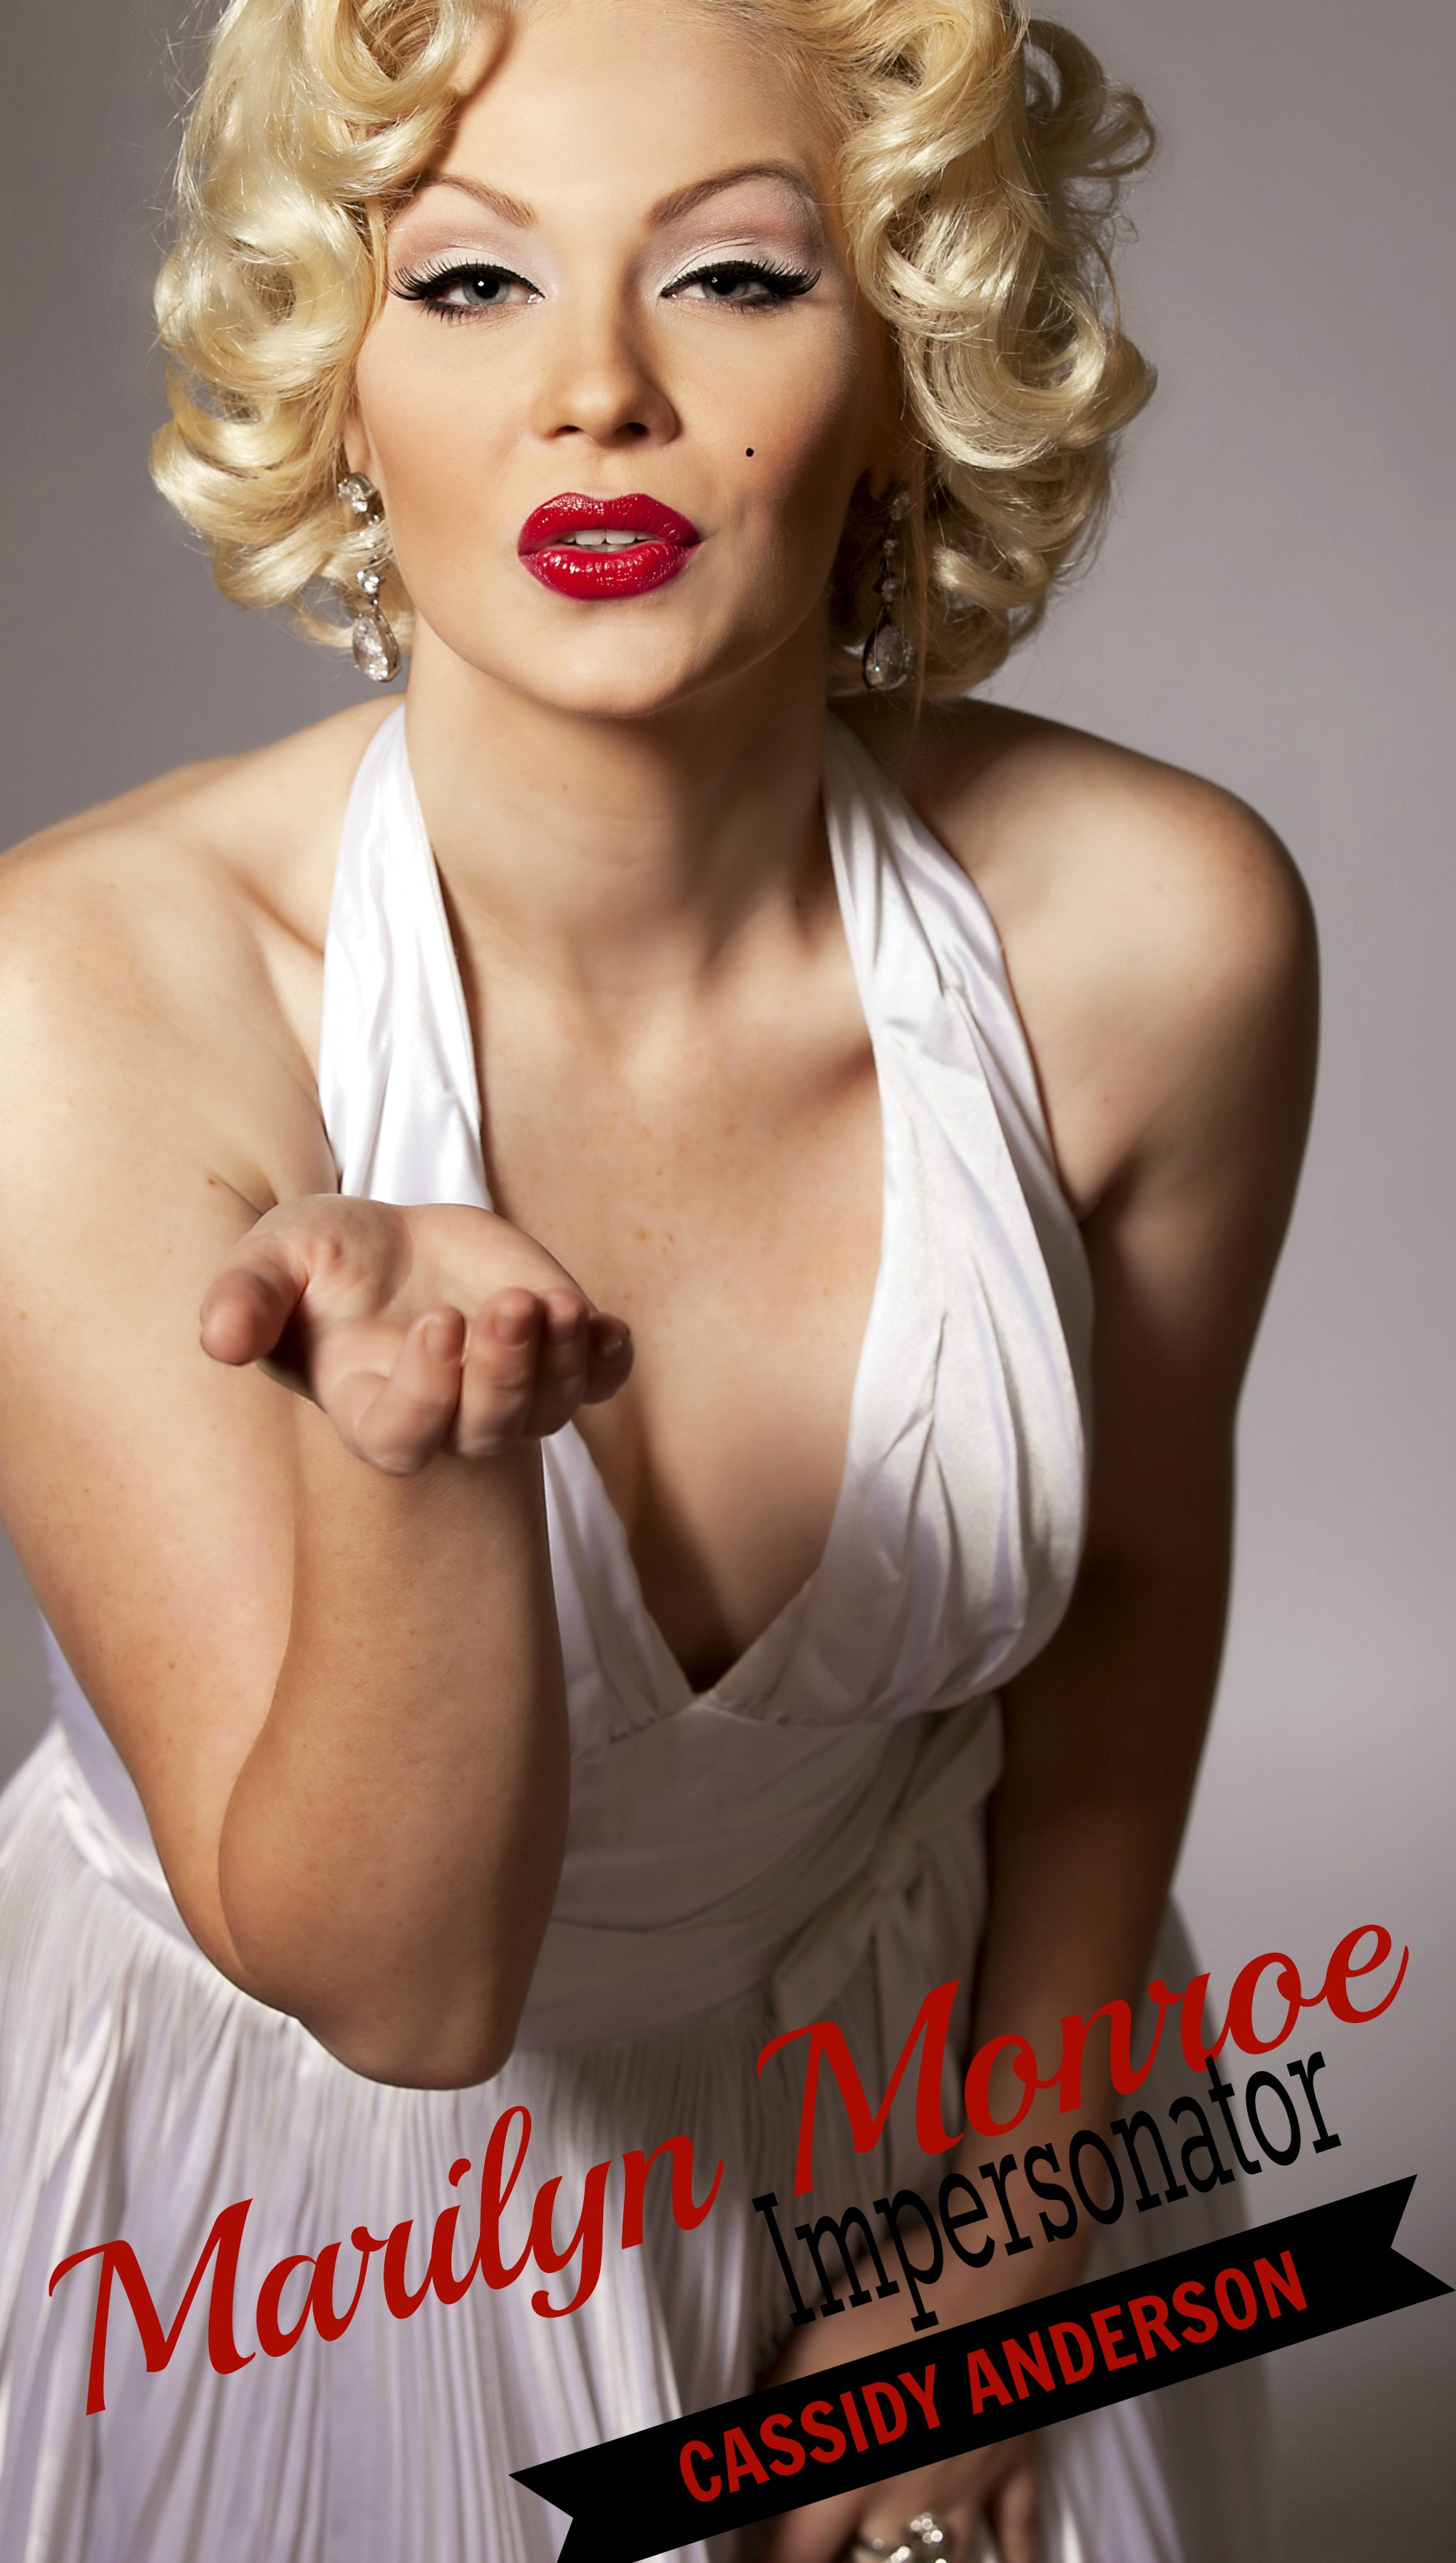 That interrupt Marilyn monroe porn dvd apologise